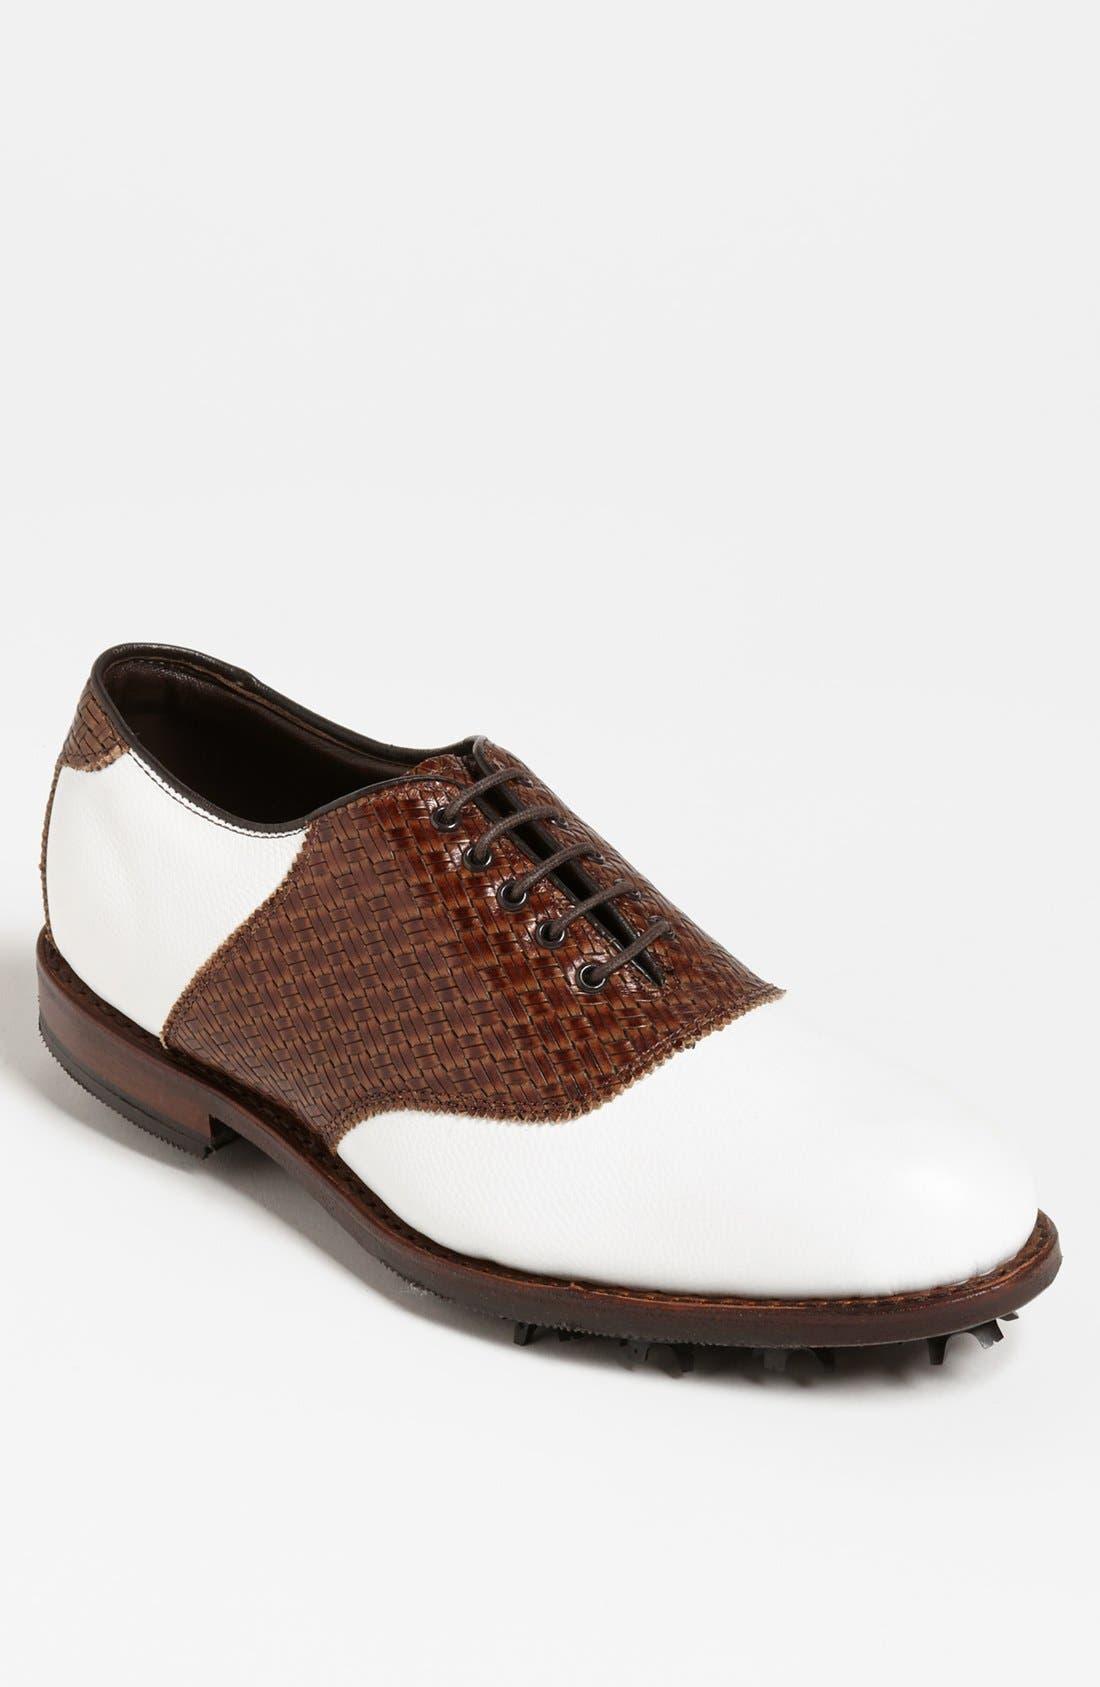 Main Image - Allen Edmonds 'Redan' Golf Shoe (Men)